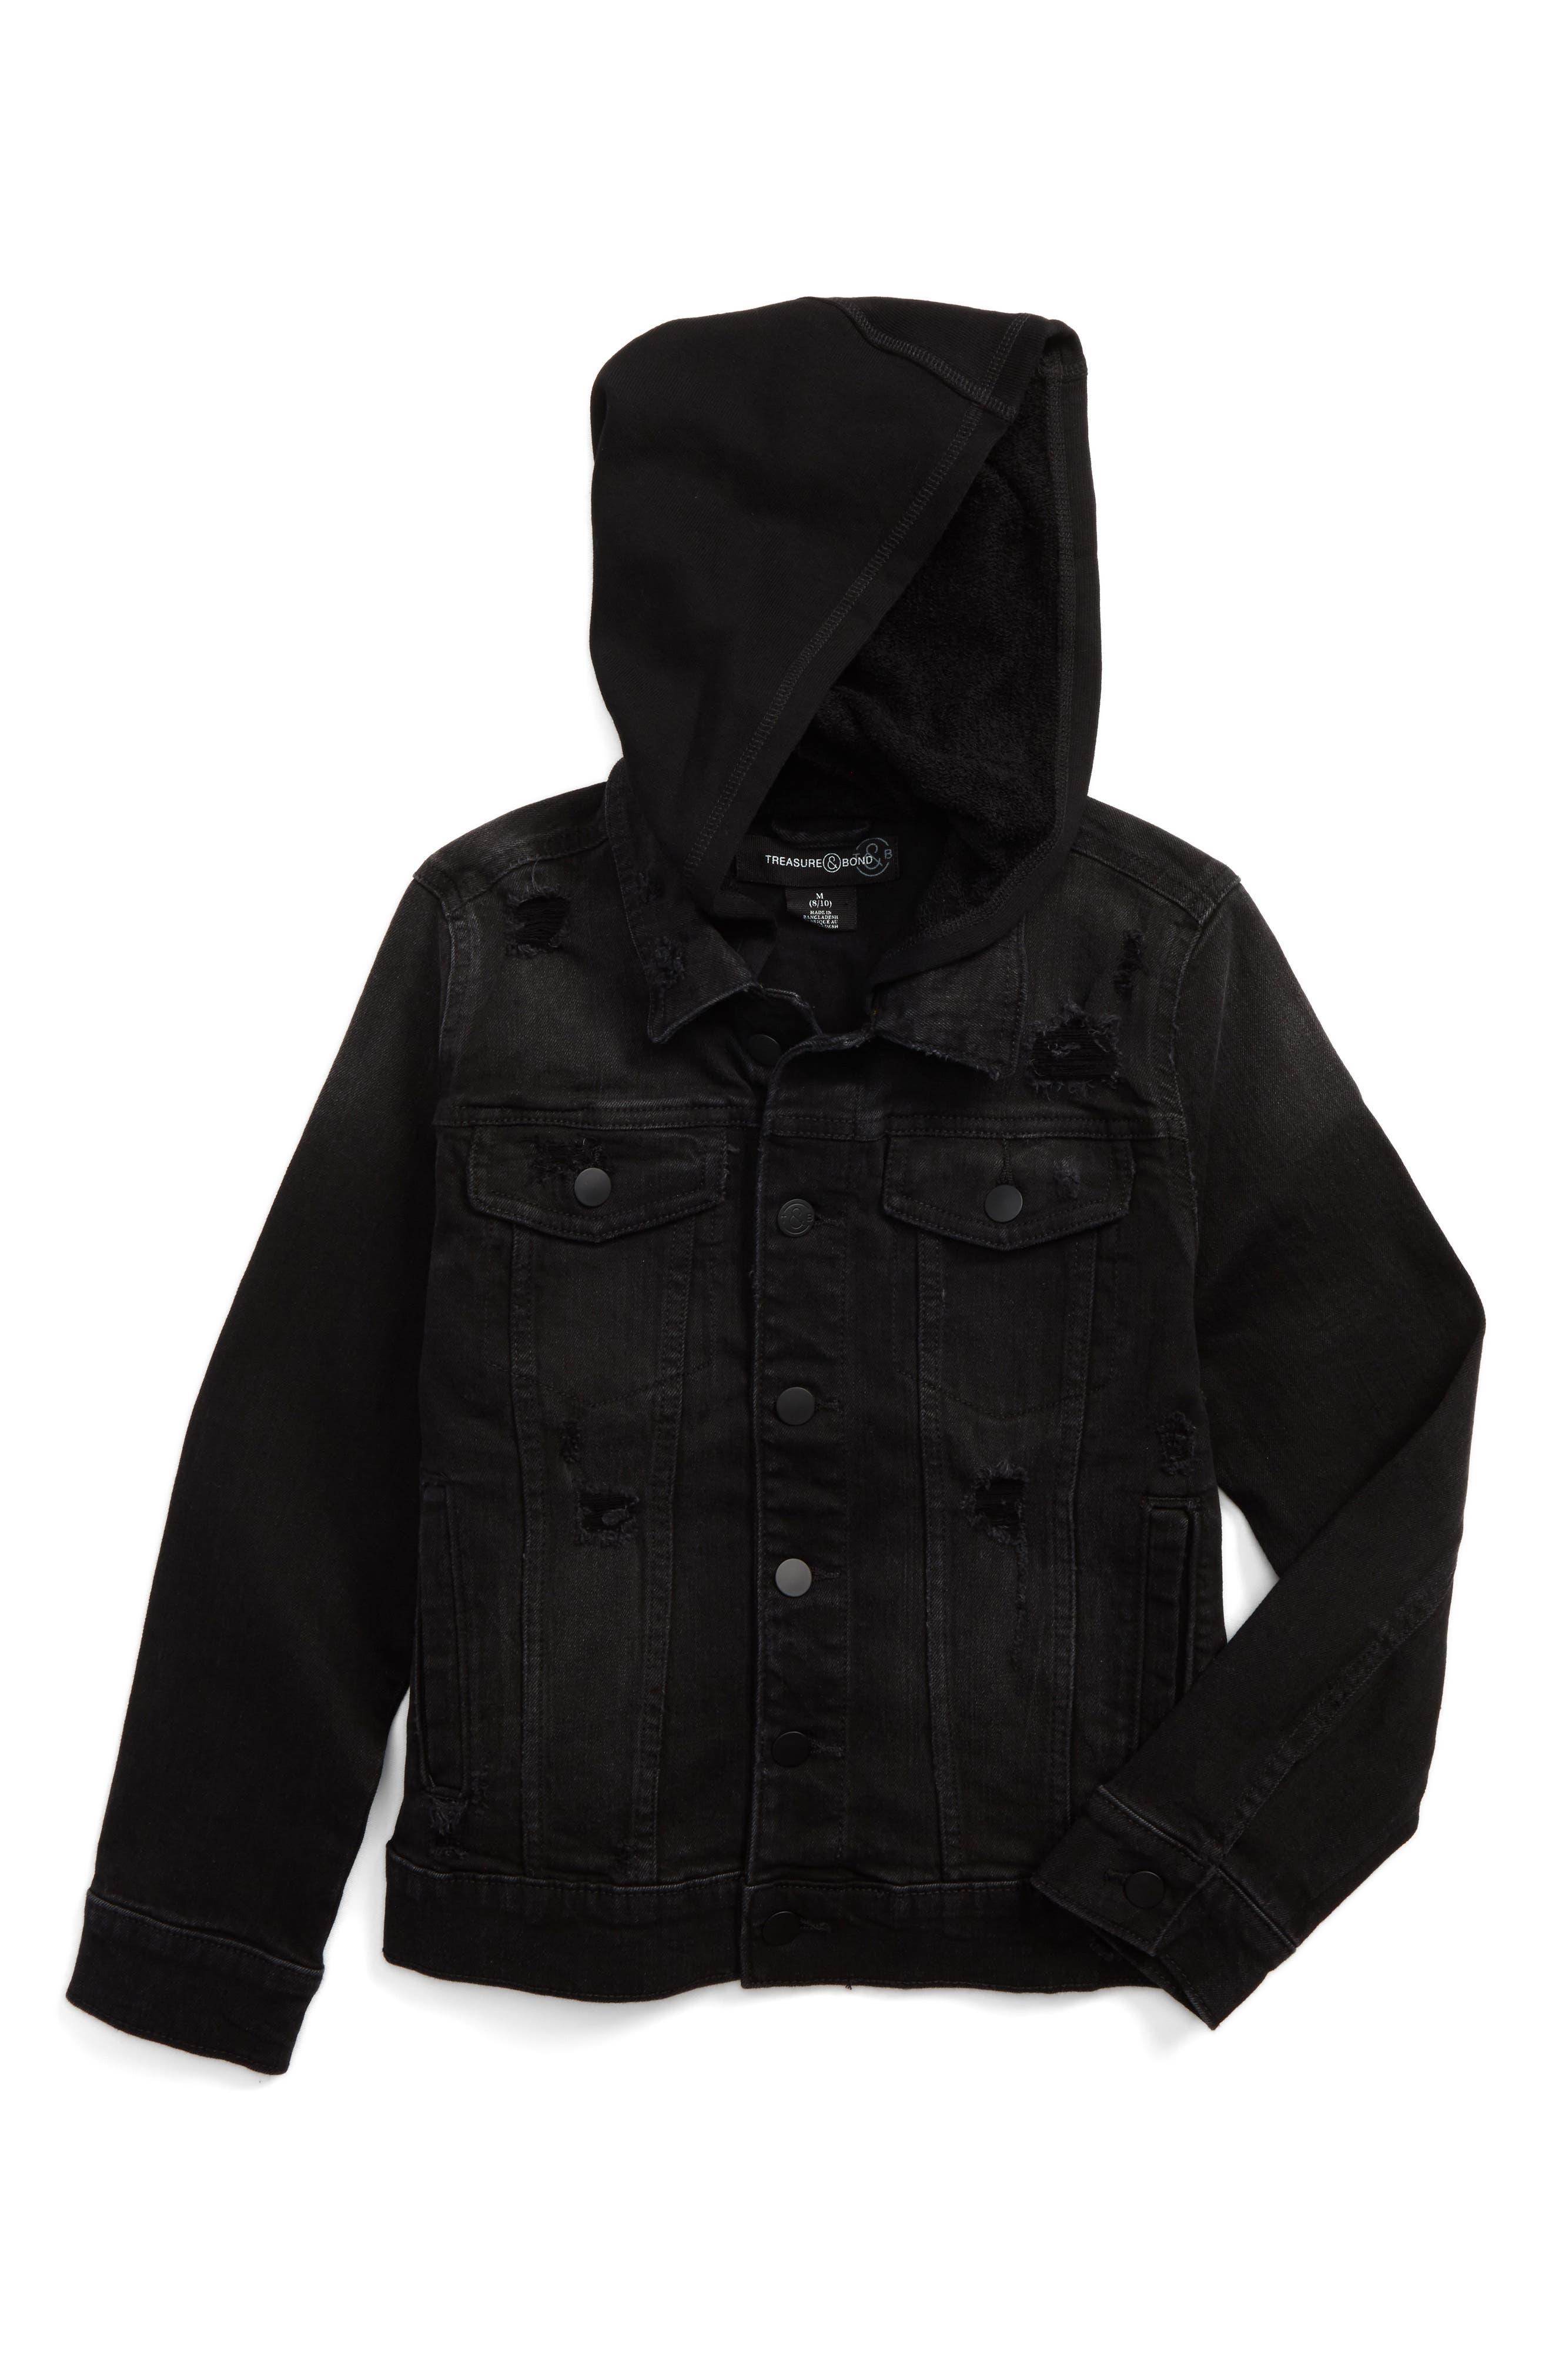 Alternate Image 1 Selected - Treasure & Bond Distressed Denim Hooded Jacket (Big Boys)